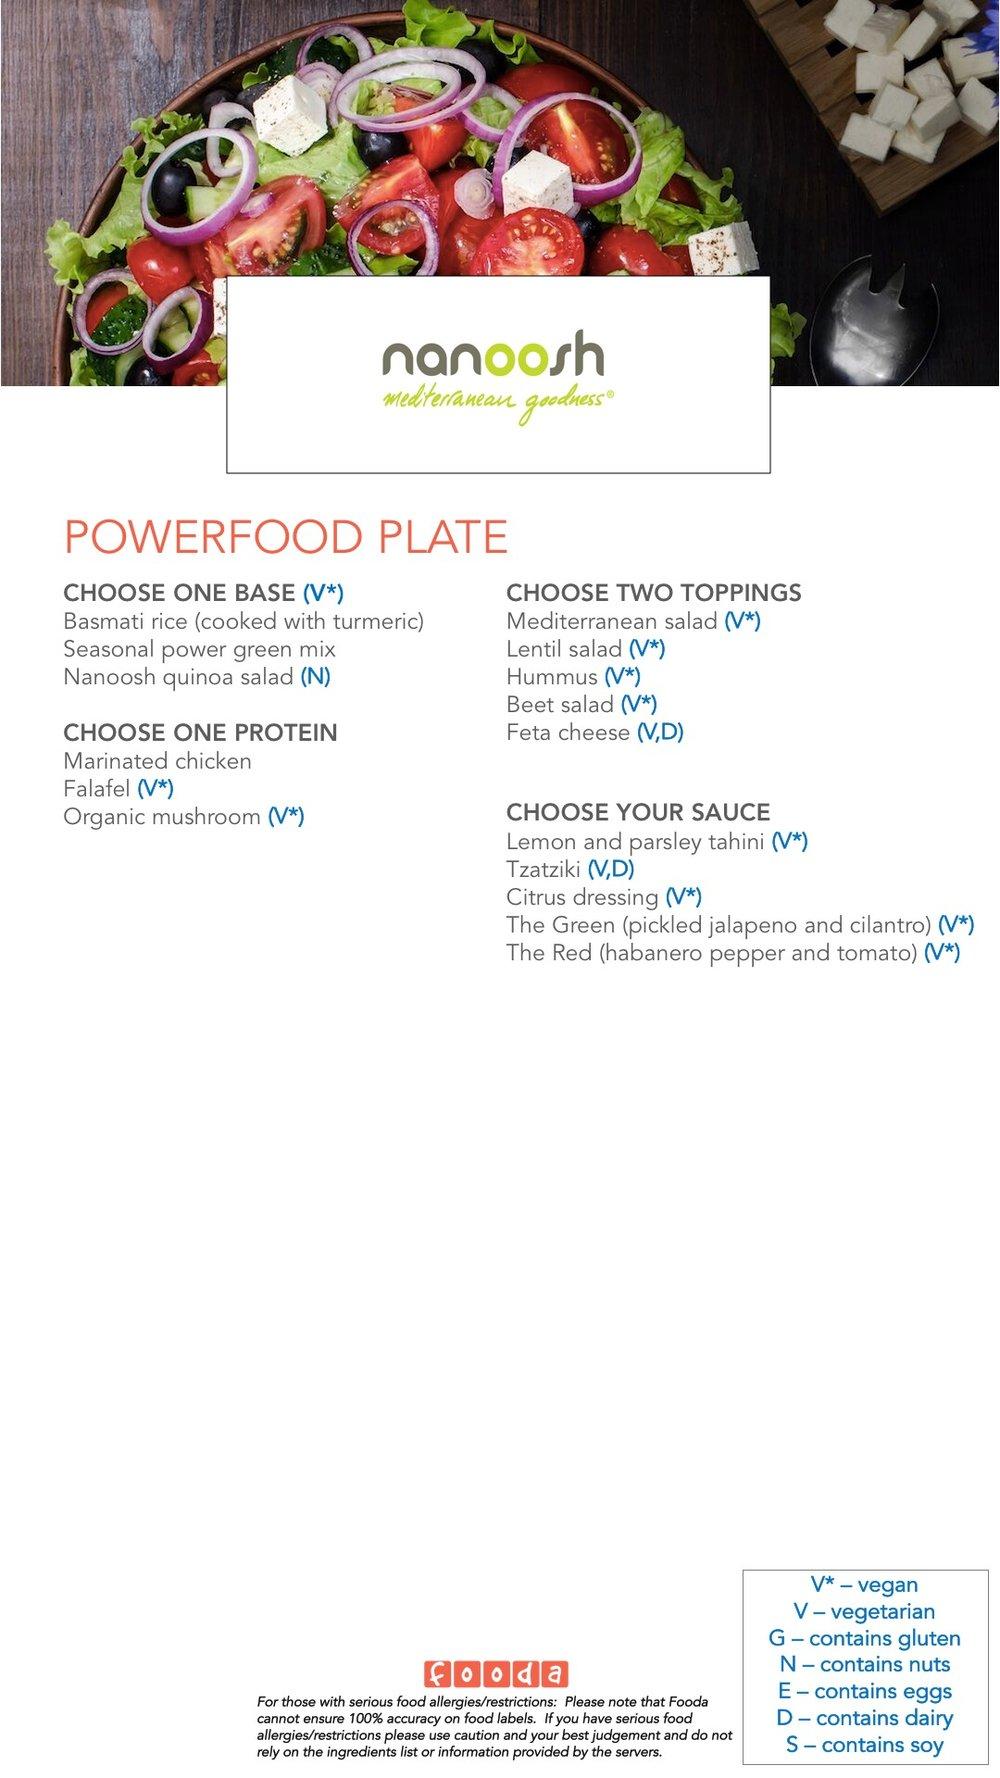 Outcome Health Nanoosh 9.22.17.jpg